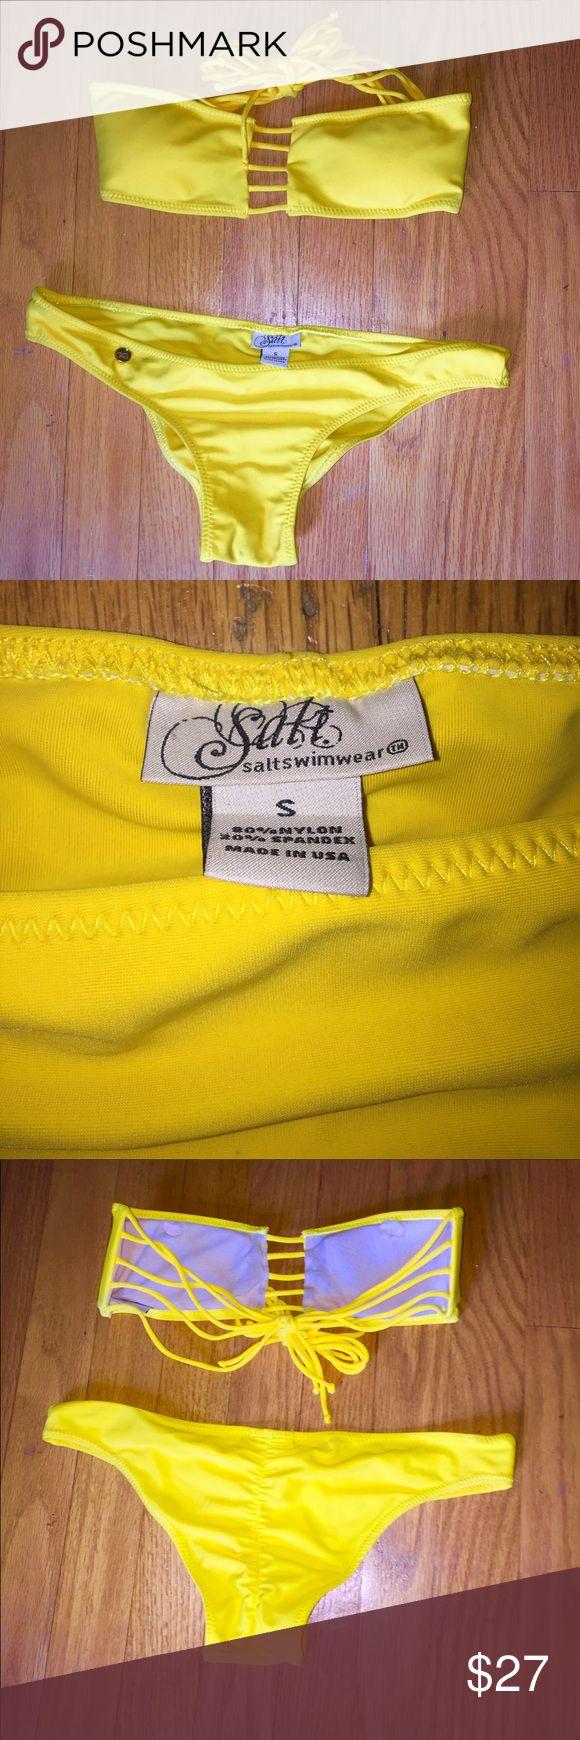 Salt swimwear bikini set S Yellow Size 4 Salt Swimwear bikini set. Bandeau top with string tie. Holes cut to put in a lighter padding. Cheeky bottoms. Please help me to clean out my closet! Salt swimwear Swim Bikinis